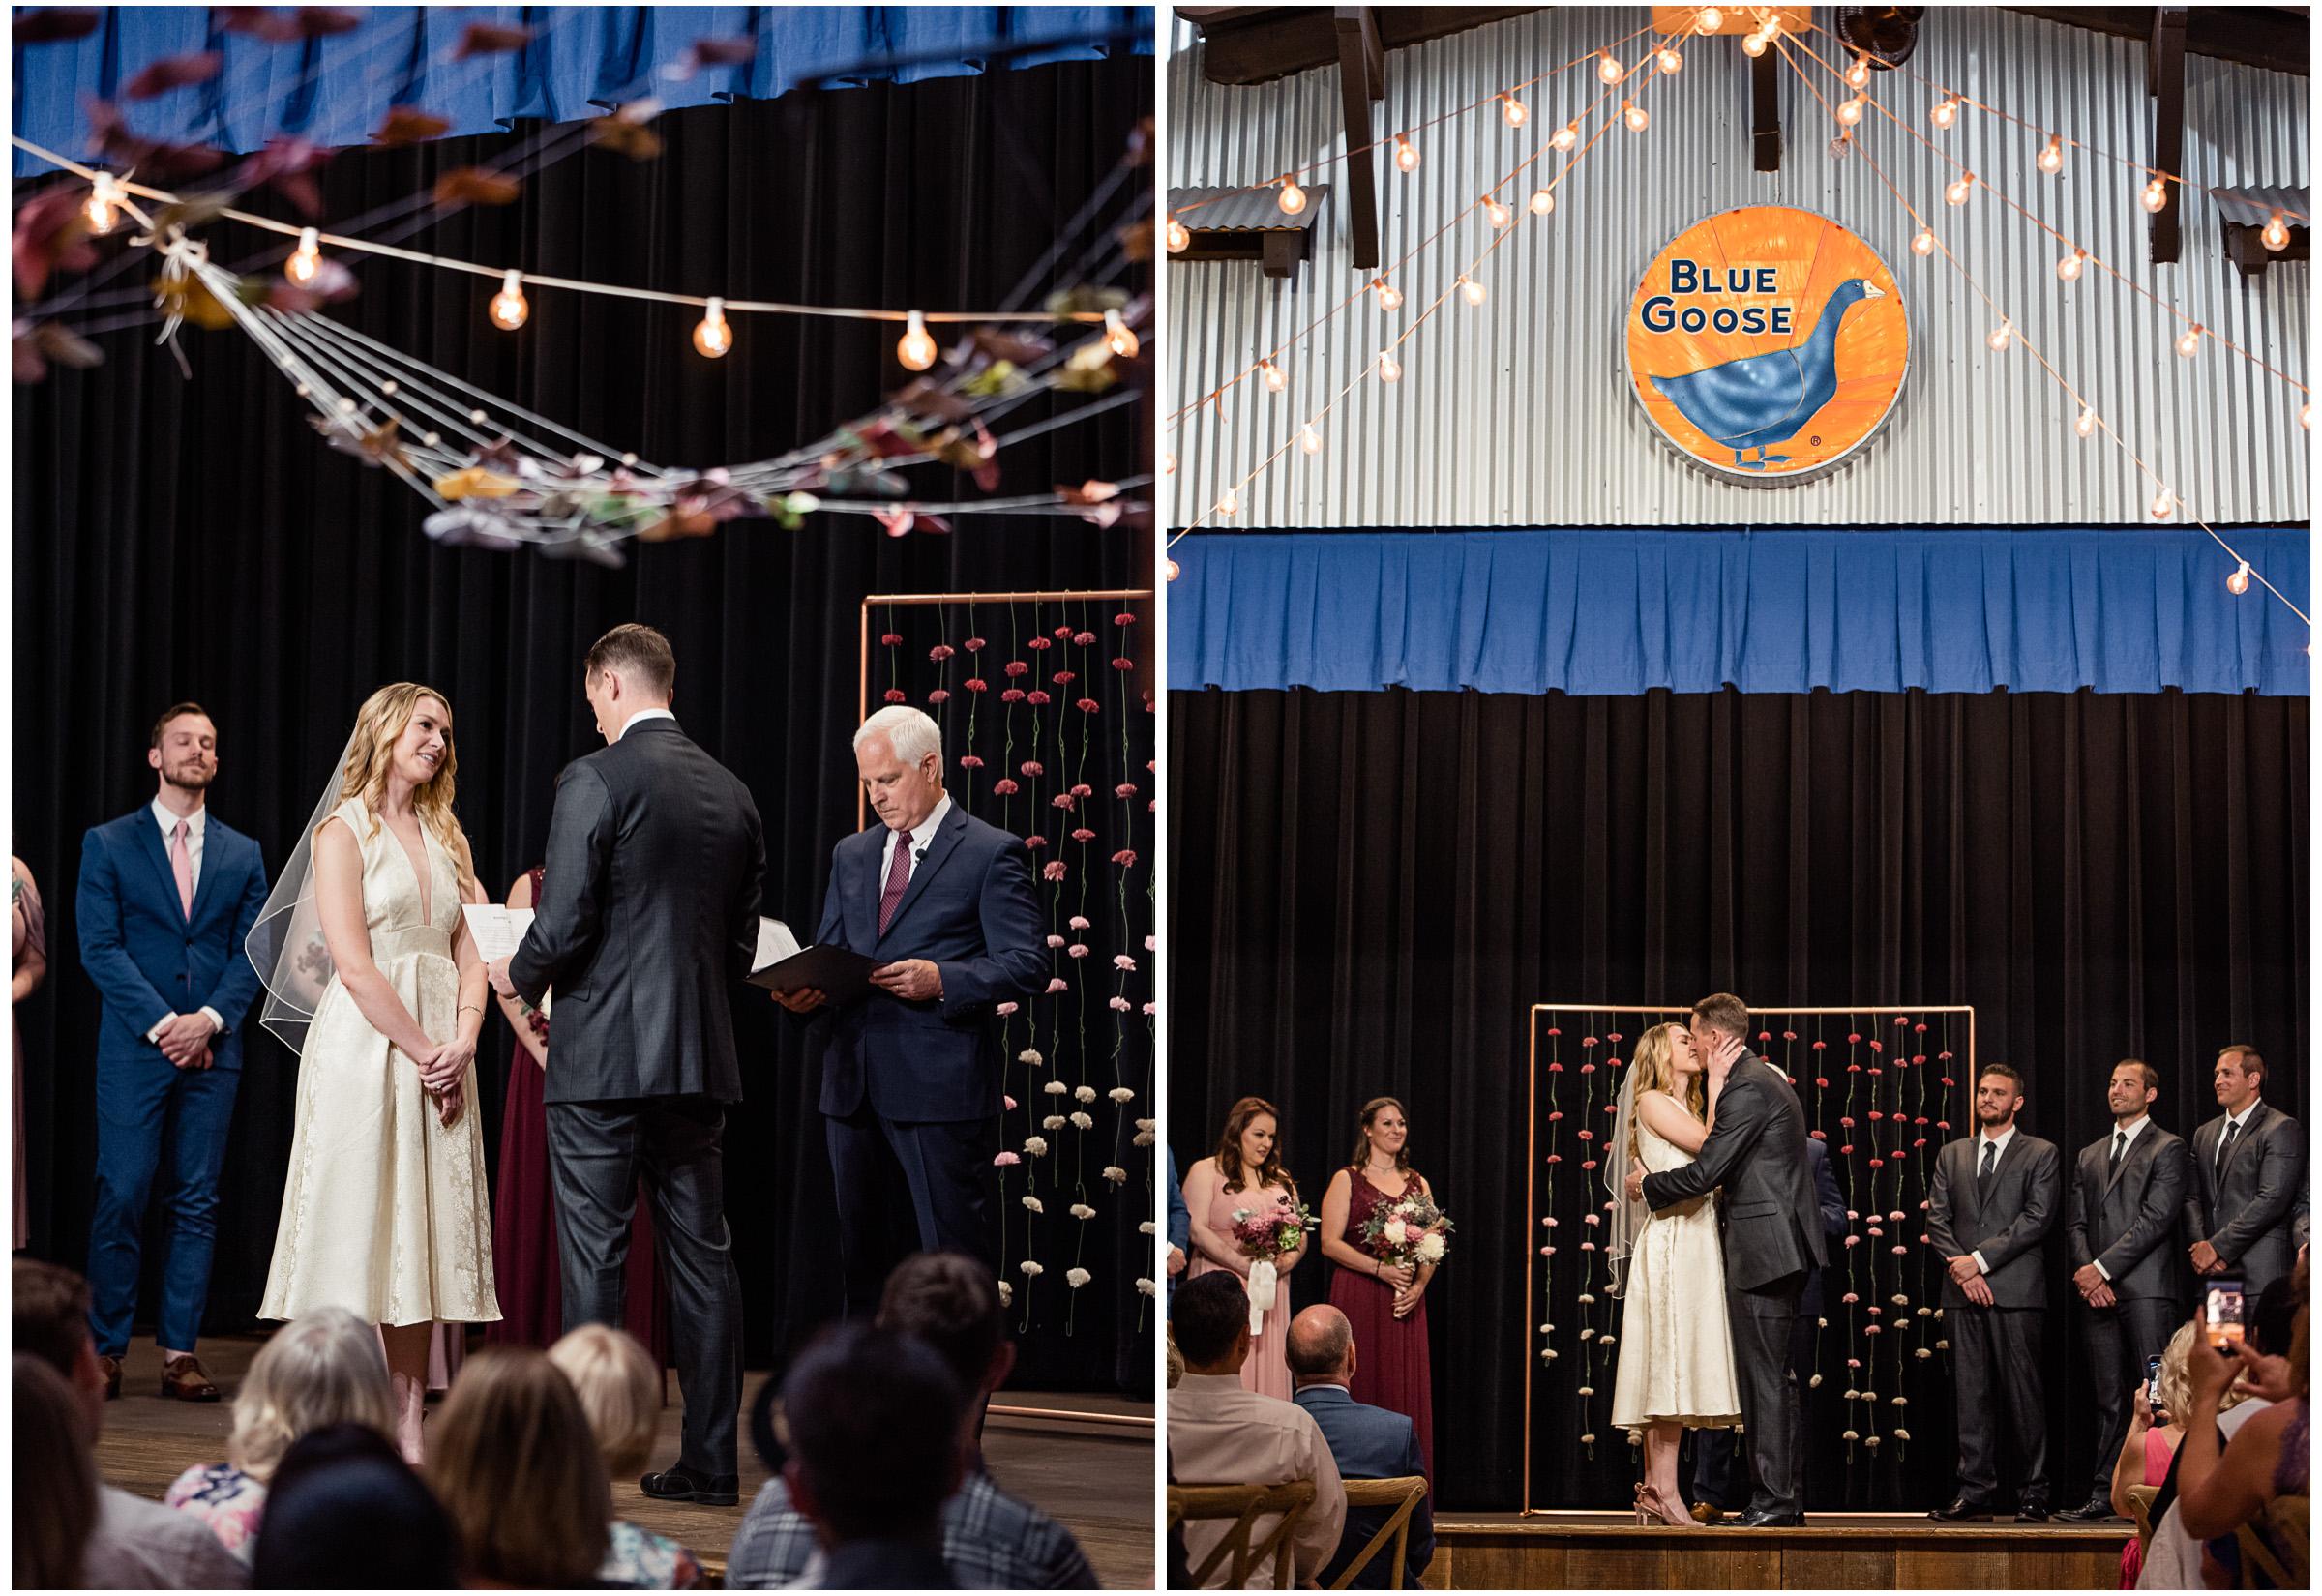 Loomis Wedding - Sacramento Photographer - Blue Goose - Justin Wilcox Photography - 13.jpg